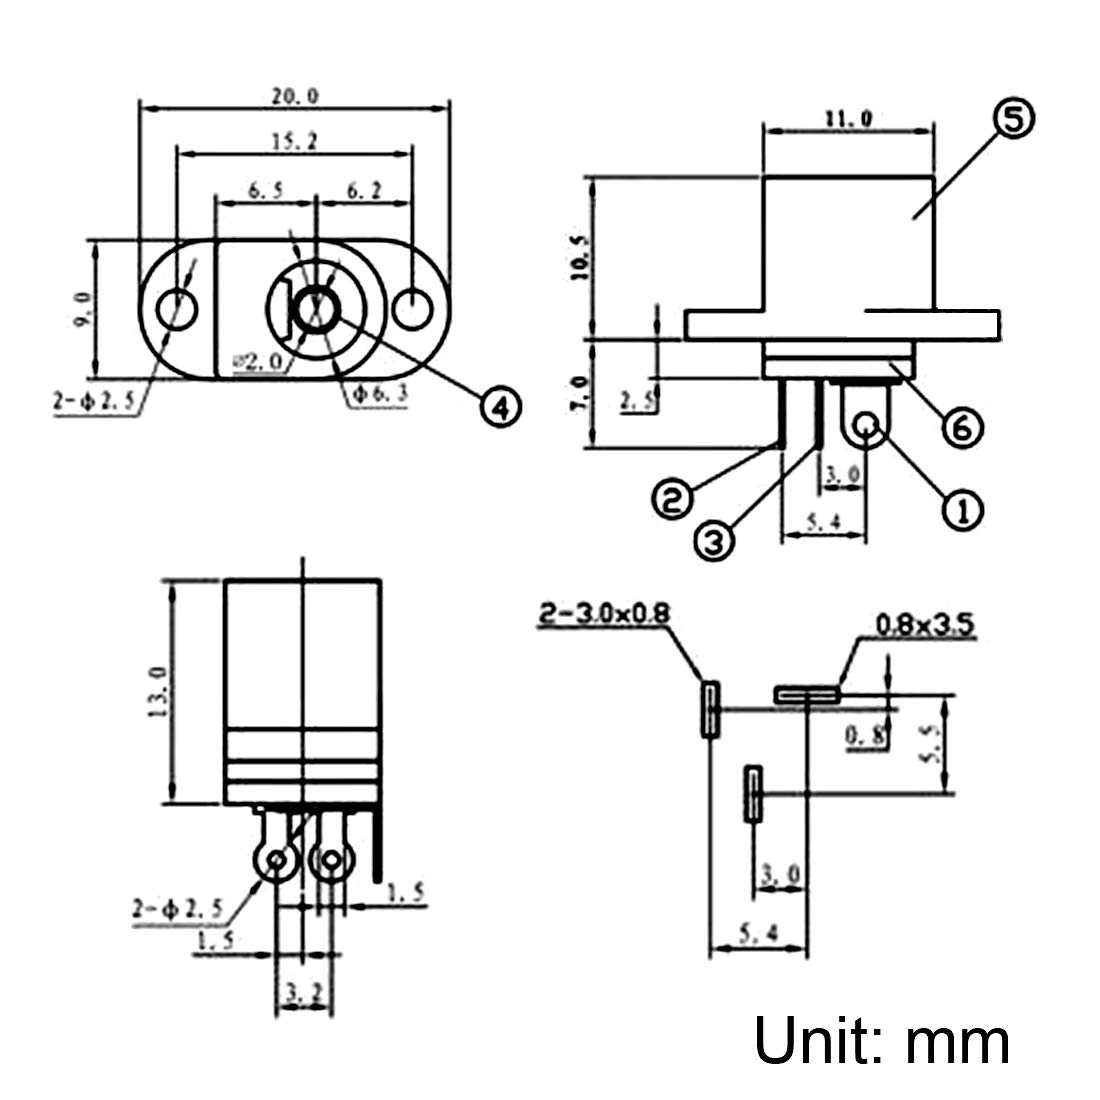 sourcing map DC-017 5.5mmx2.0mm Jack Alimentazione DC Presa 3 Pin connettore Femmina da Pannello 15pz